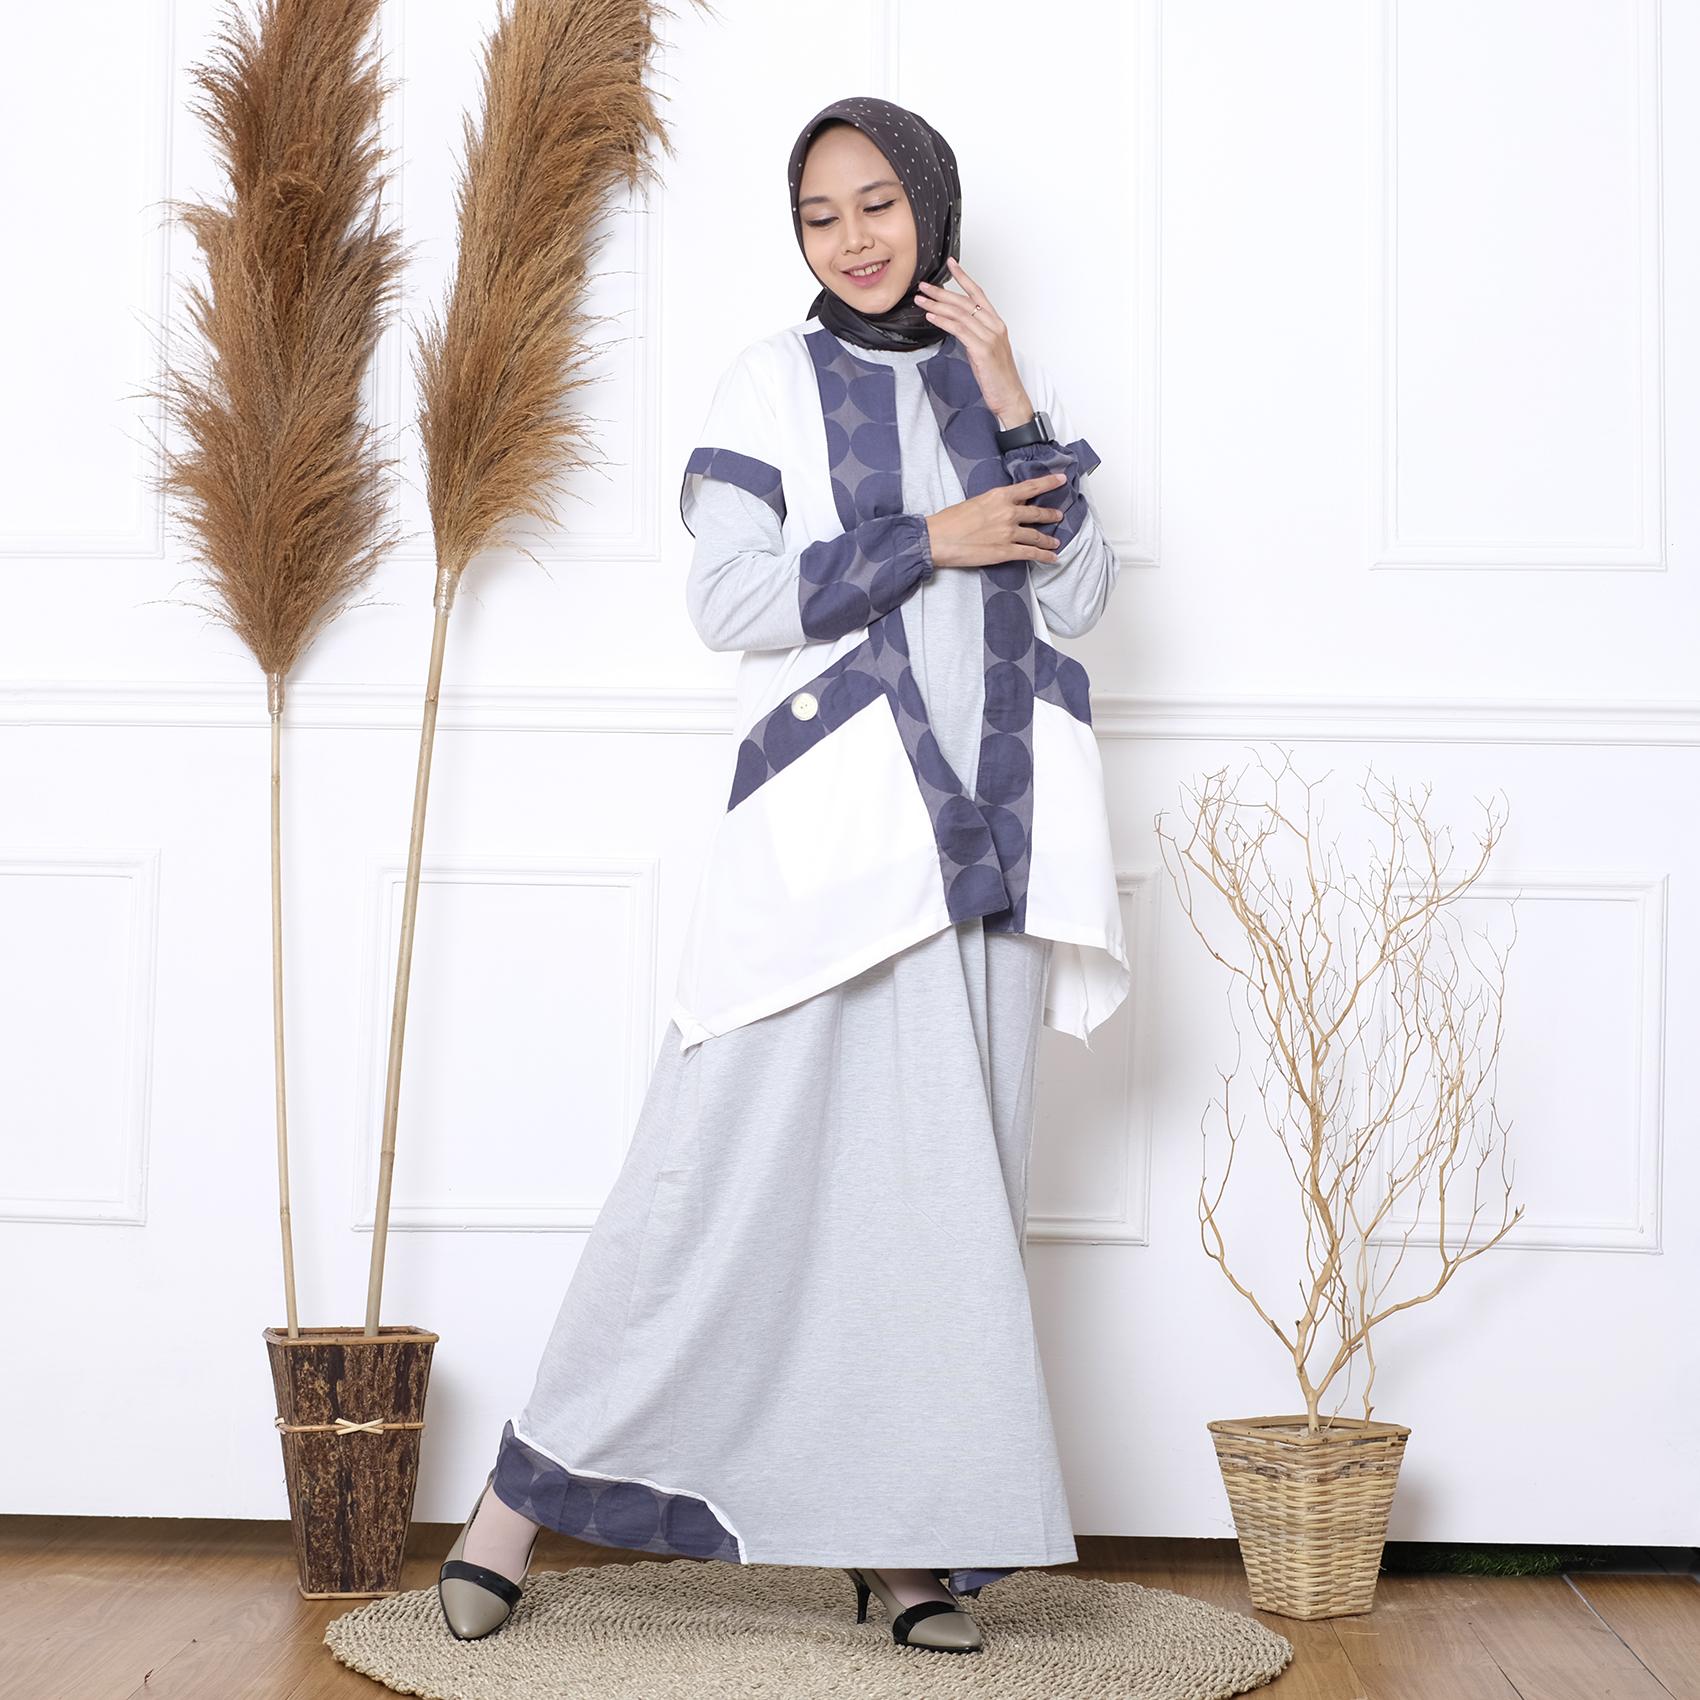 zee haura etnik dress by.haymee | gamis etnik syari